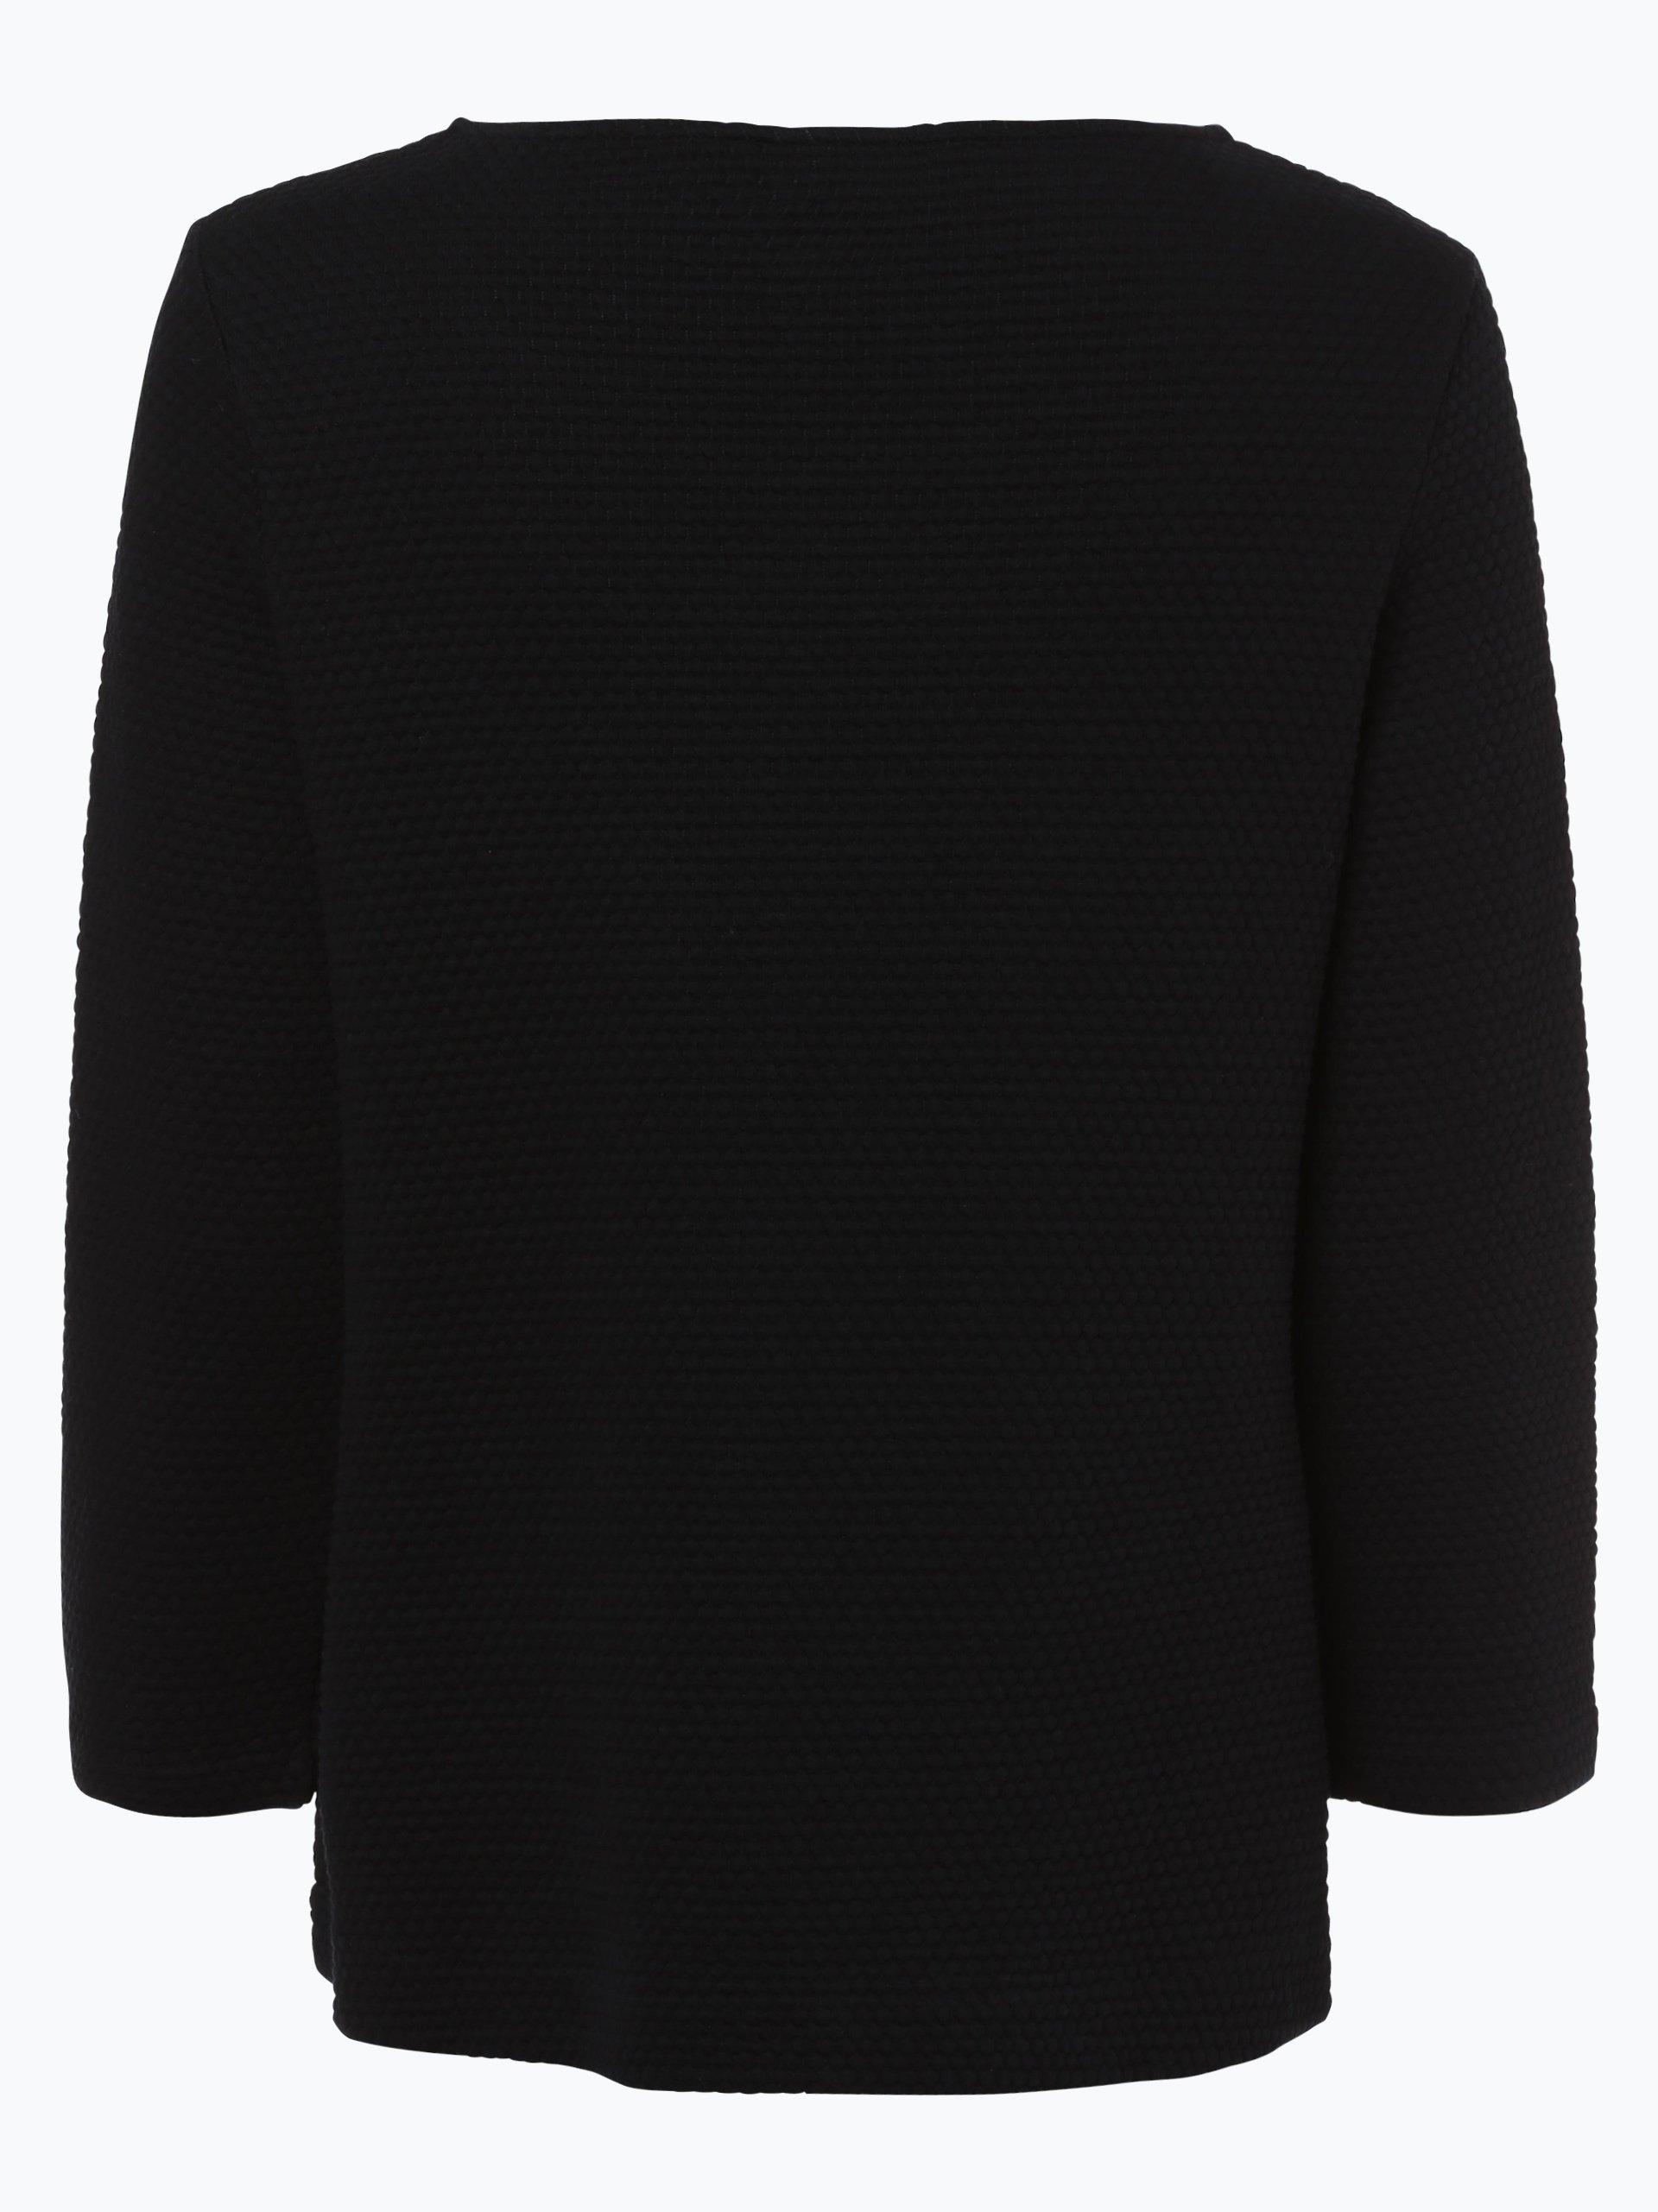 tommy hilfiger damen sweatshirt biona schwarz uni online. Black Bedroom Furniture Sets. Home Design Ideas